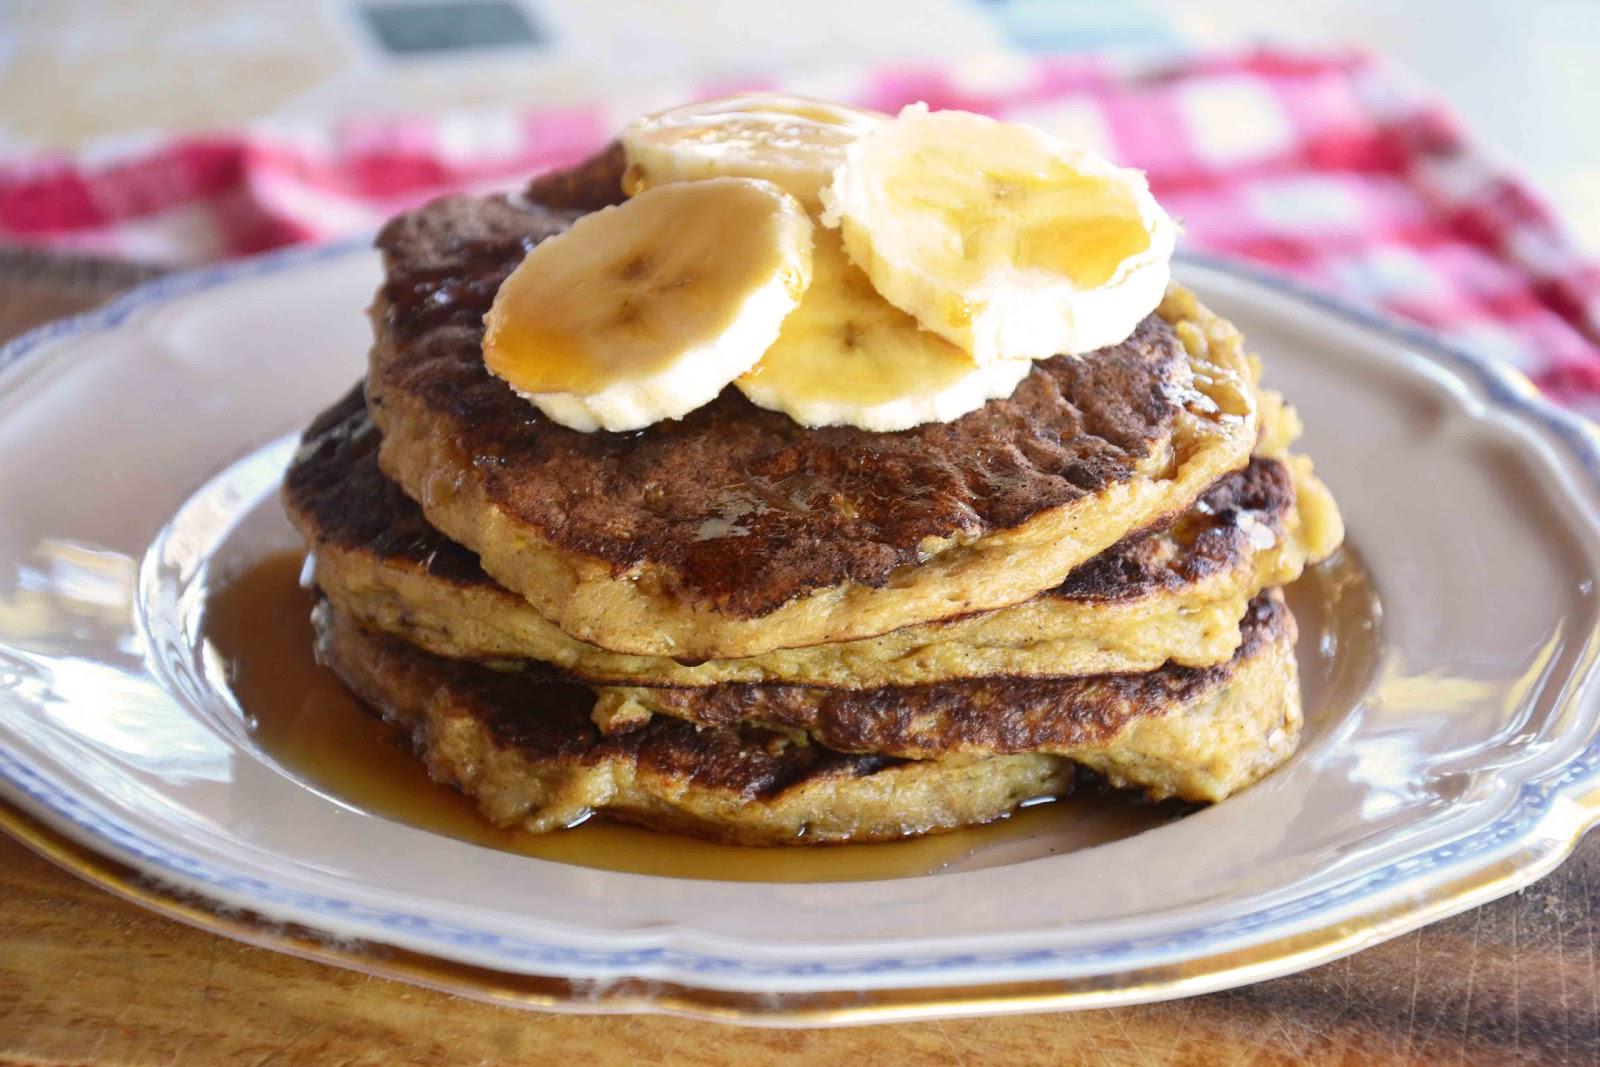 The eccentric Cook: Oatmeal/Pancakes -> Oatmeal-Banana Cake